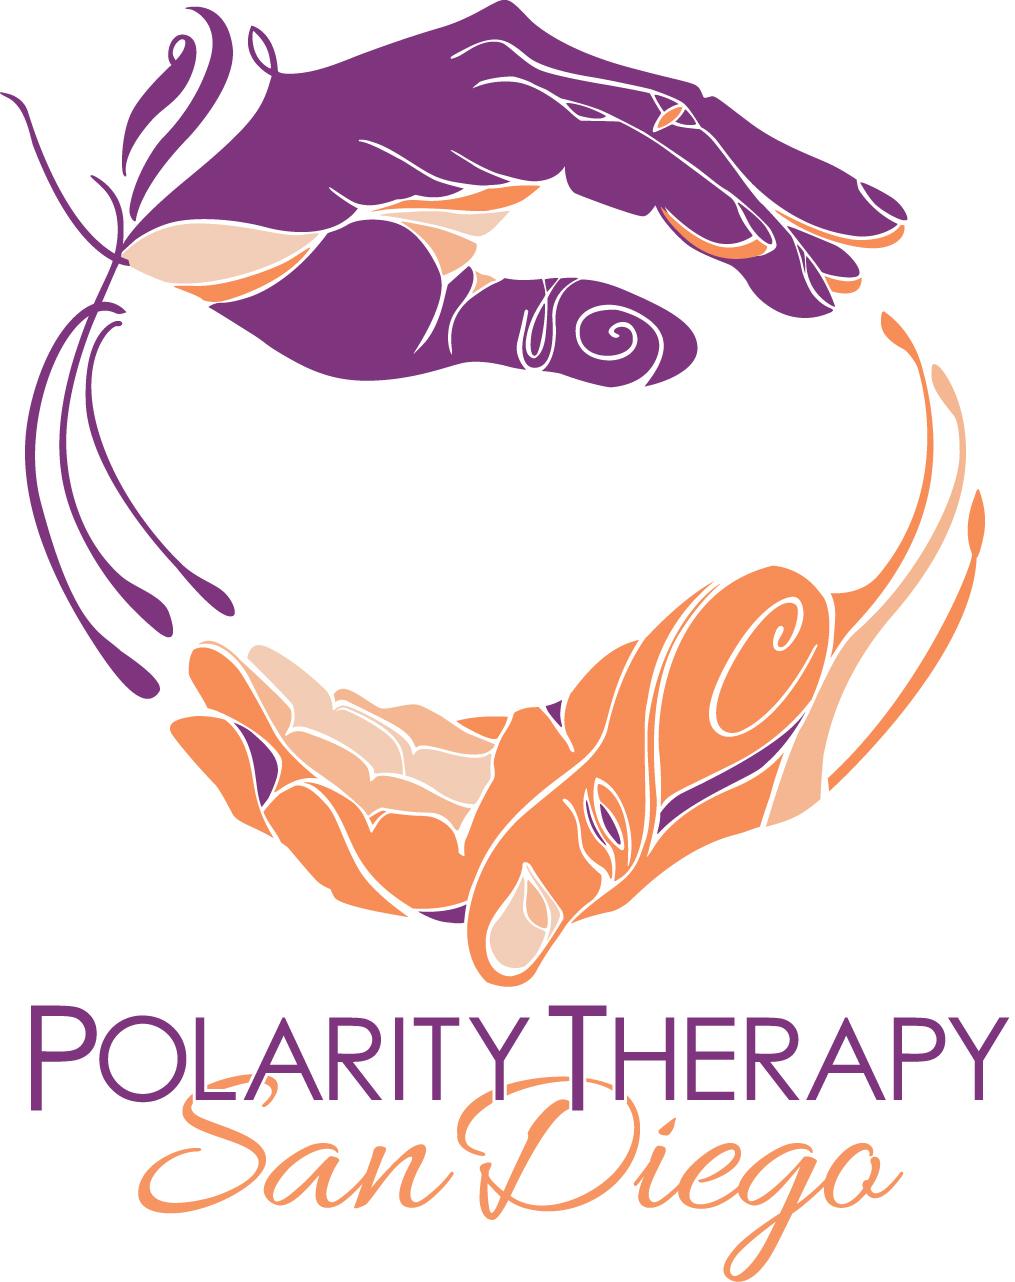 Polarity_therapy_SD_FINAL (3).jpg